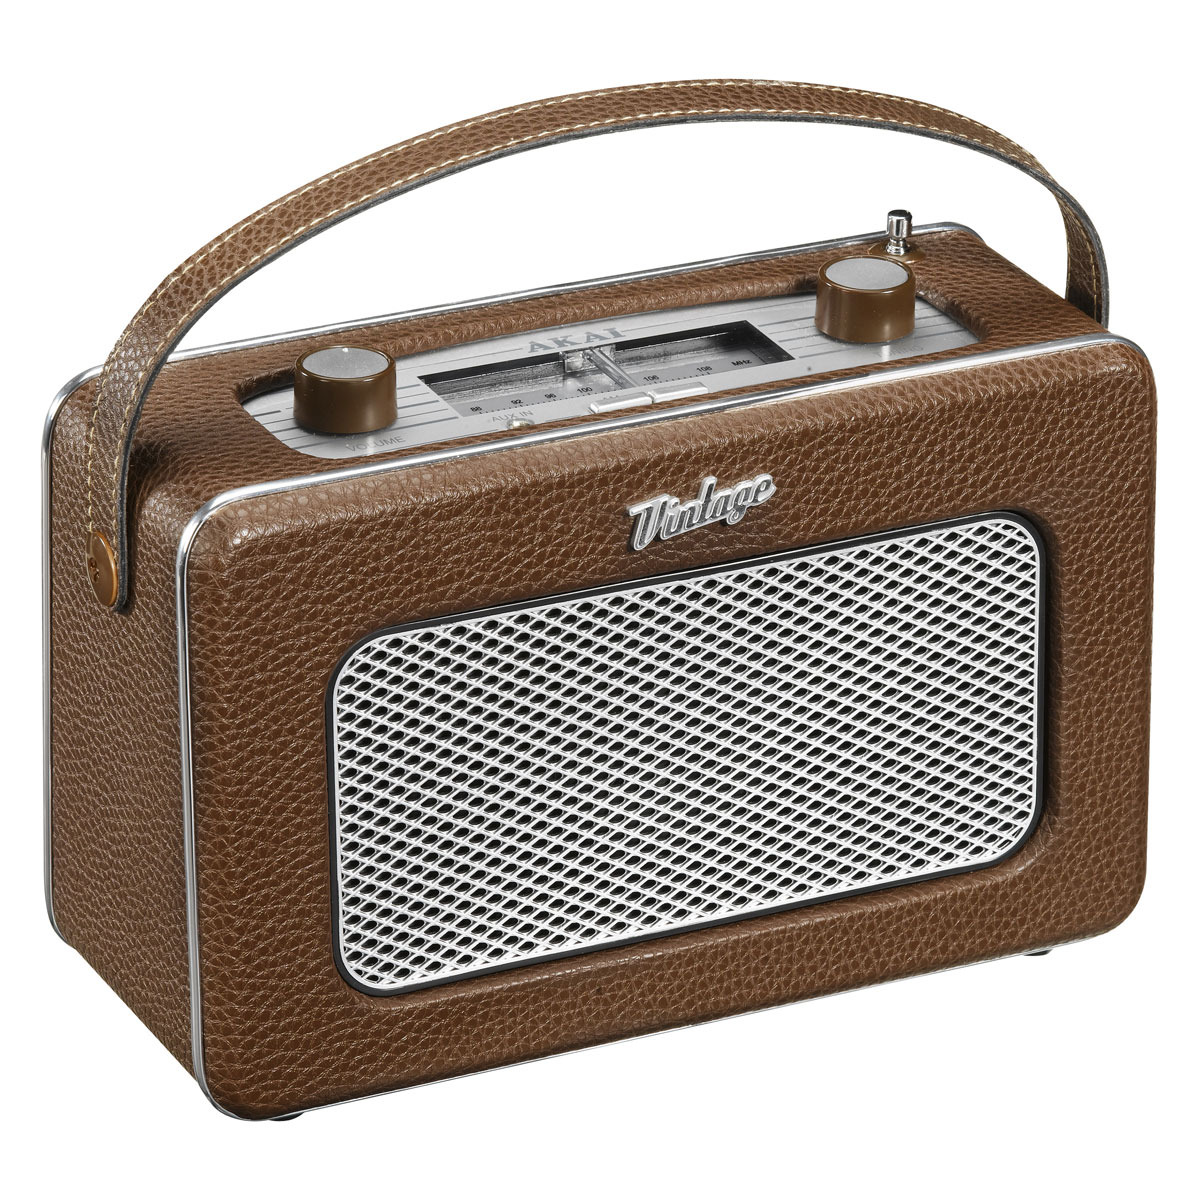 akai apr 200 marron radio radio r veil aka sur. Black Bedroom Furniture Sets. Home Design Ideas